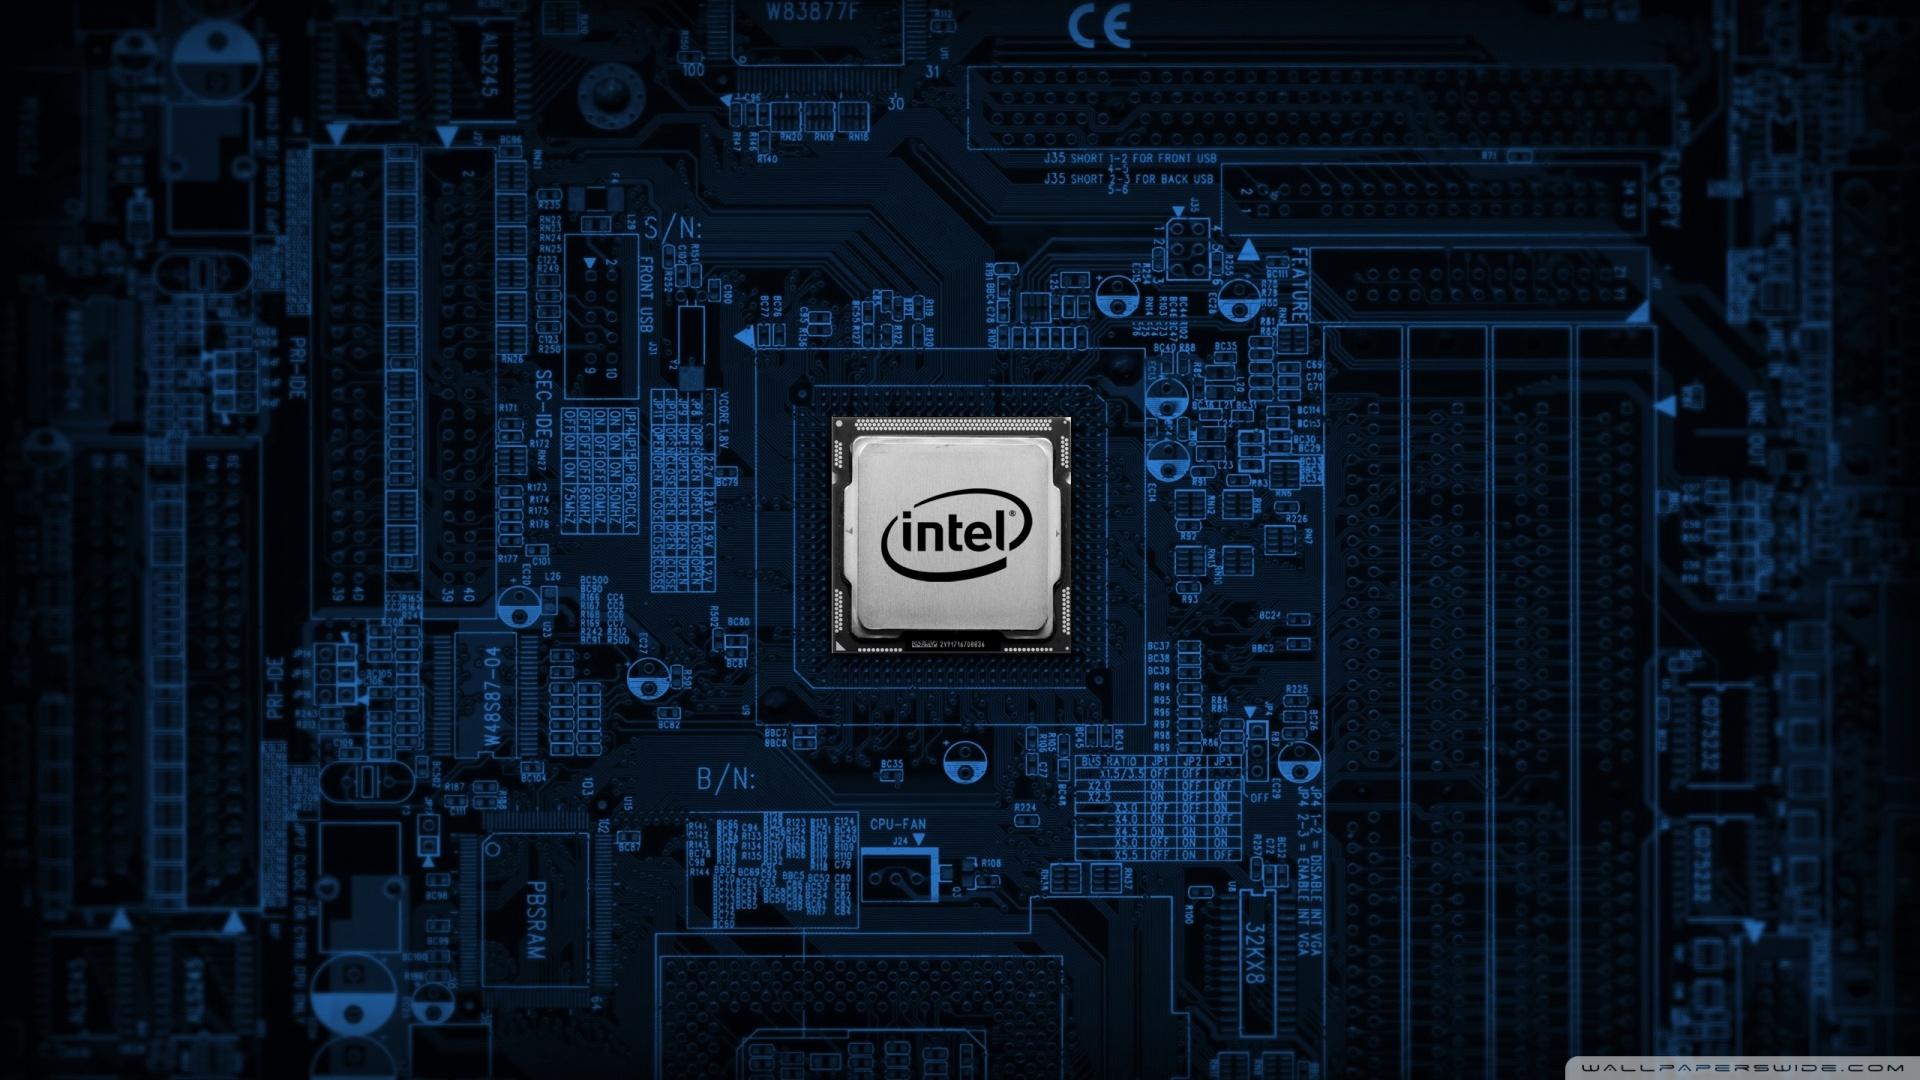 Pin Download 1920x1080 Intel Core I7 Hd Desktop Wallpaper 1920x1080